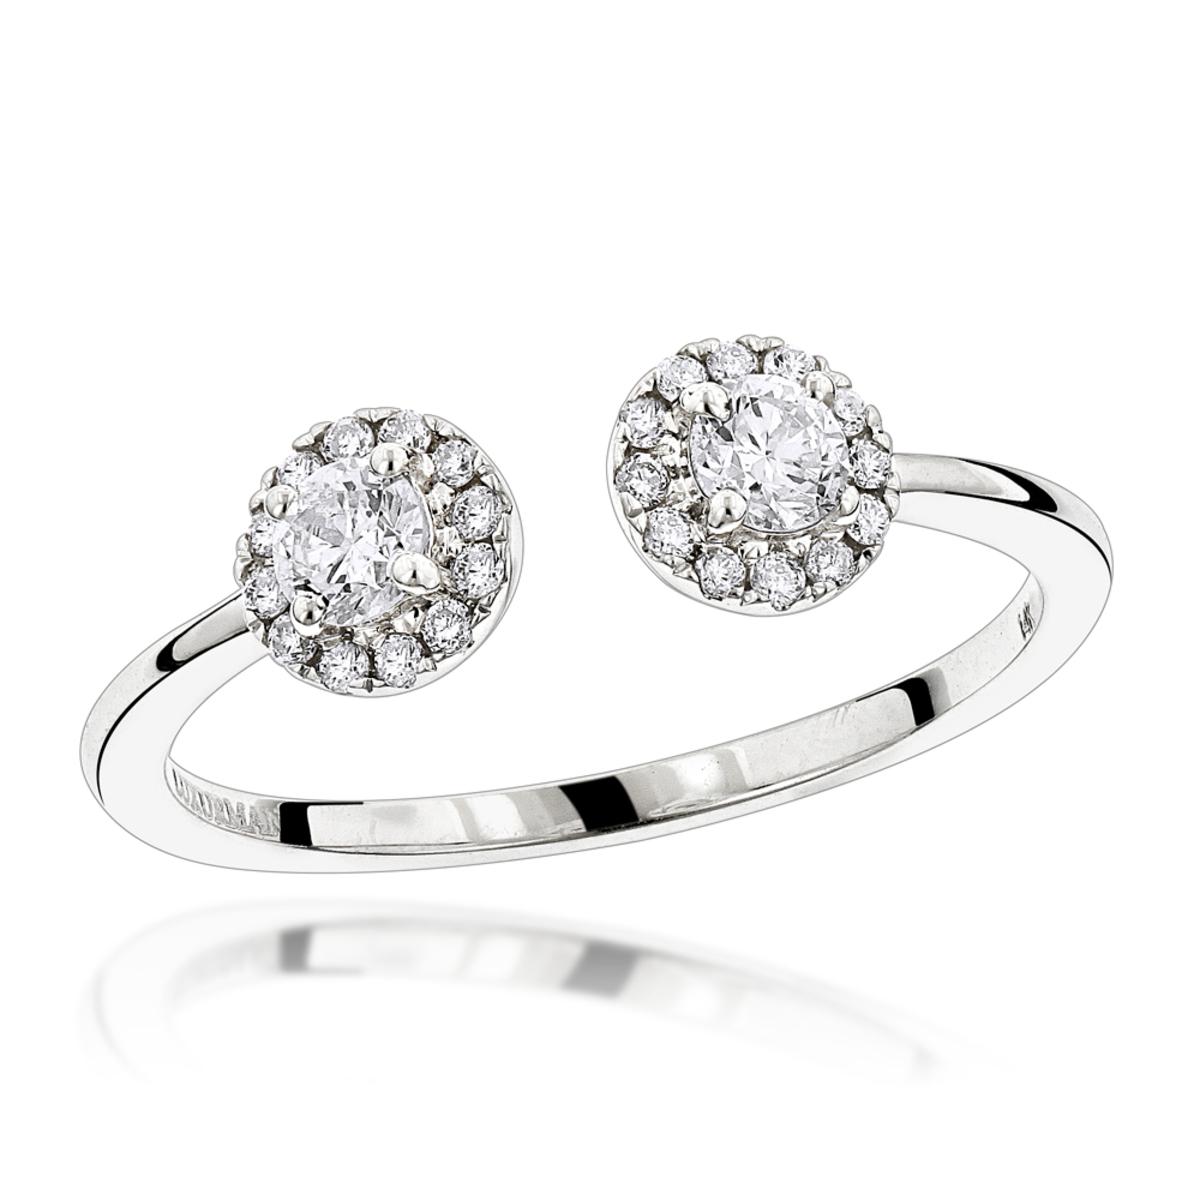 2 Stone Rings: 14K Gold Diamond Halo Ring for Women 0.4ct